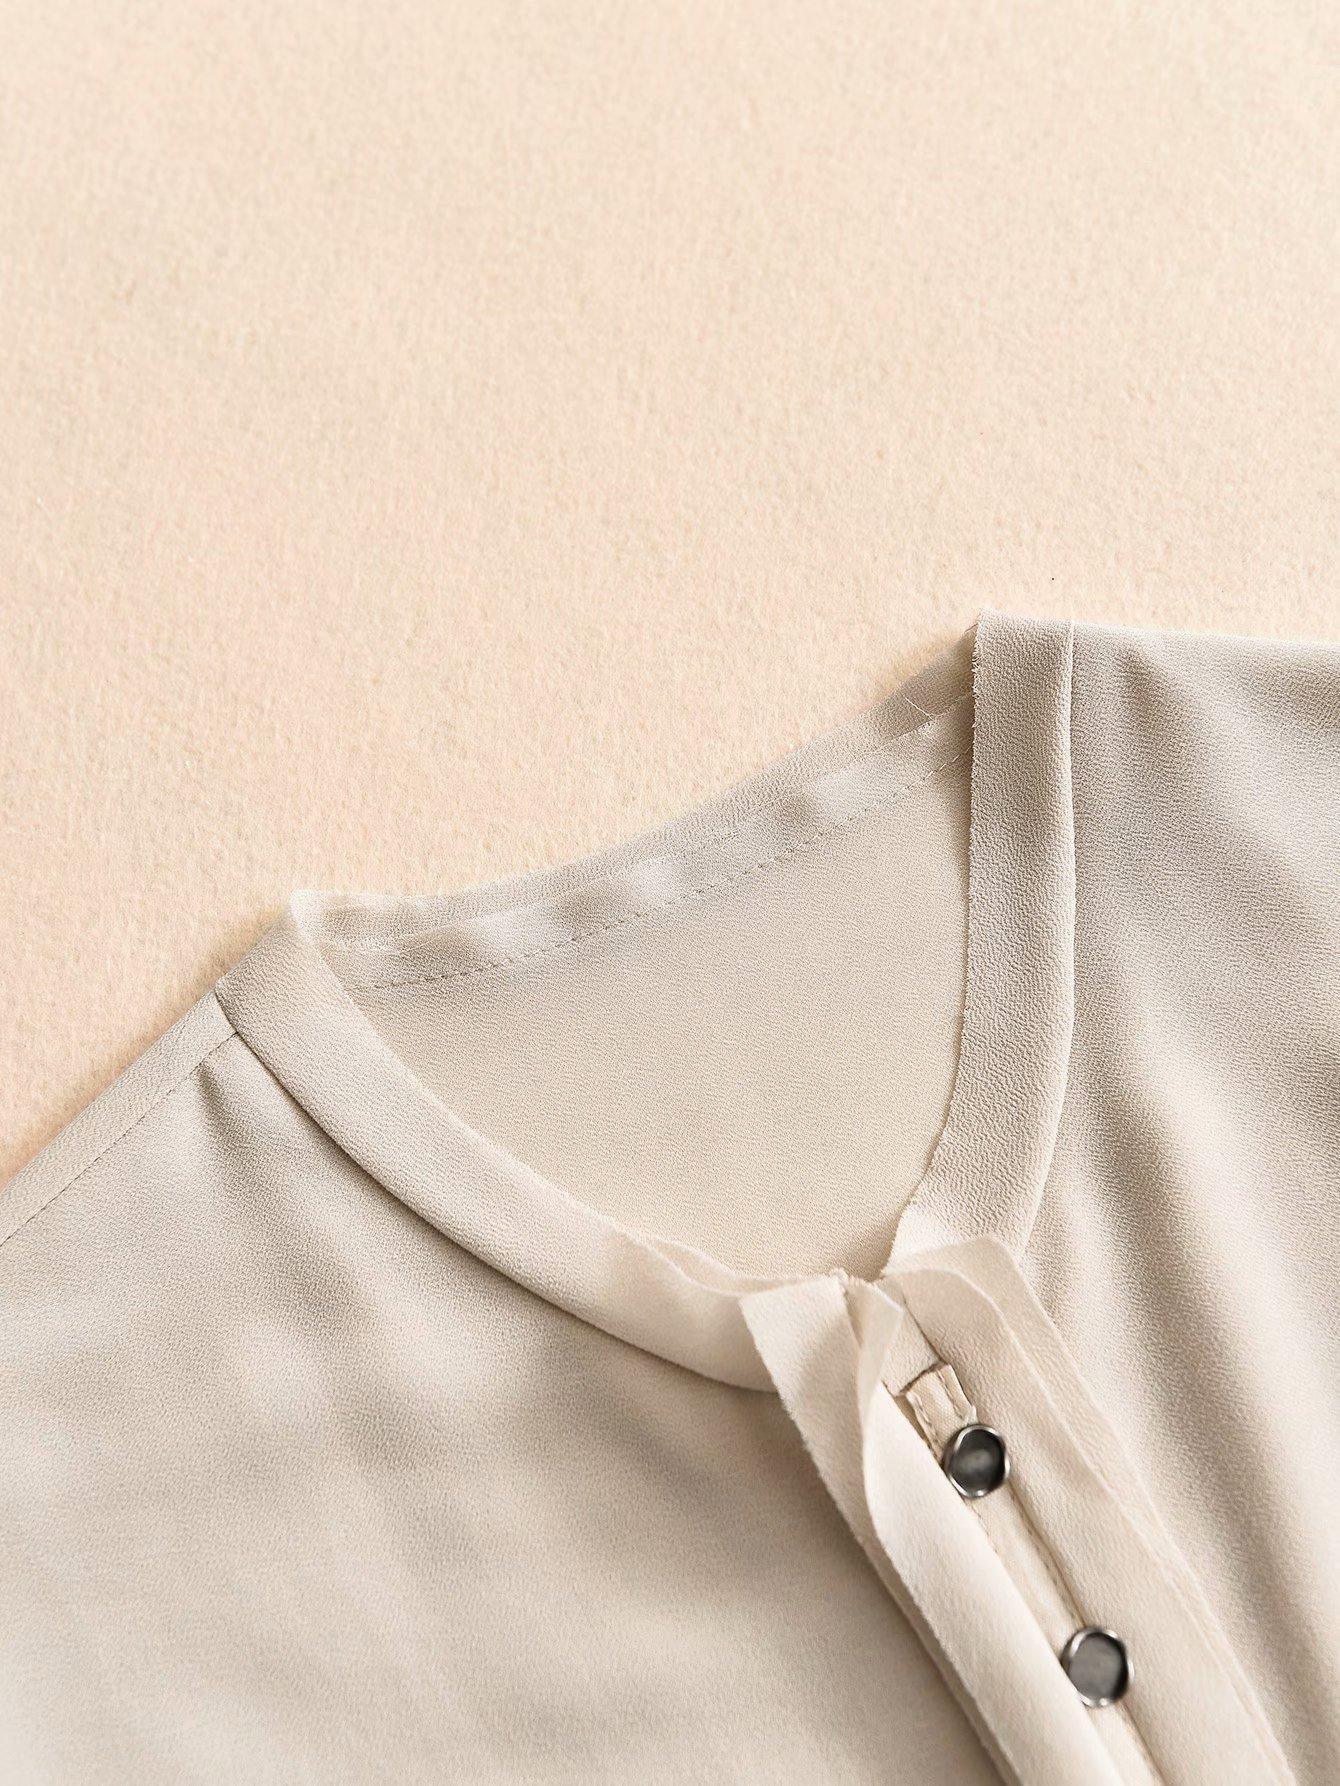 summer translucent women's chiffon shirt wholesale nihaojewelry NHAM241368